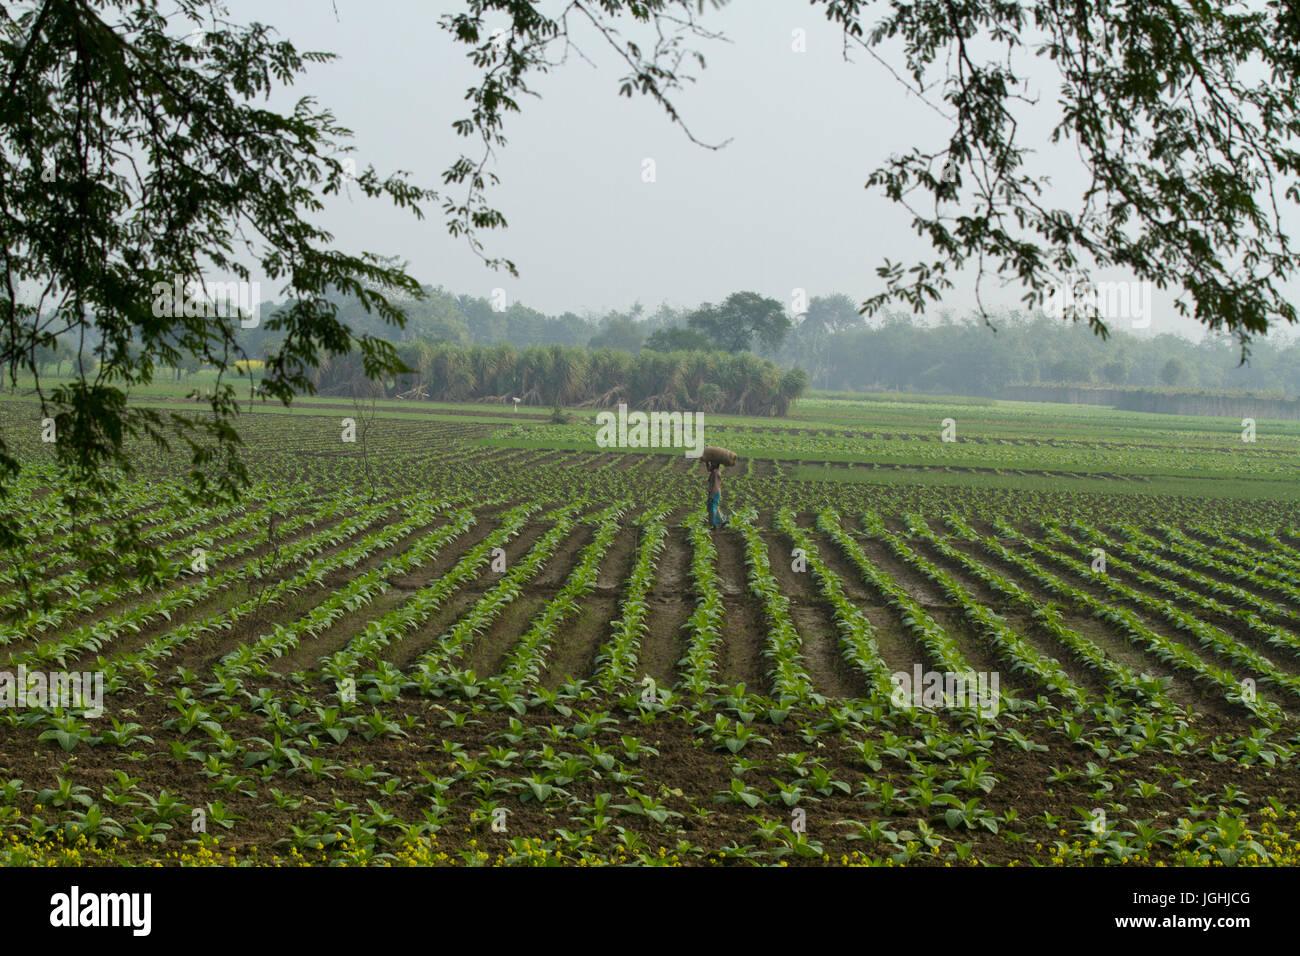 Champ de tabac au Bangladesh, Meherpur Photo Stock